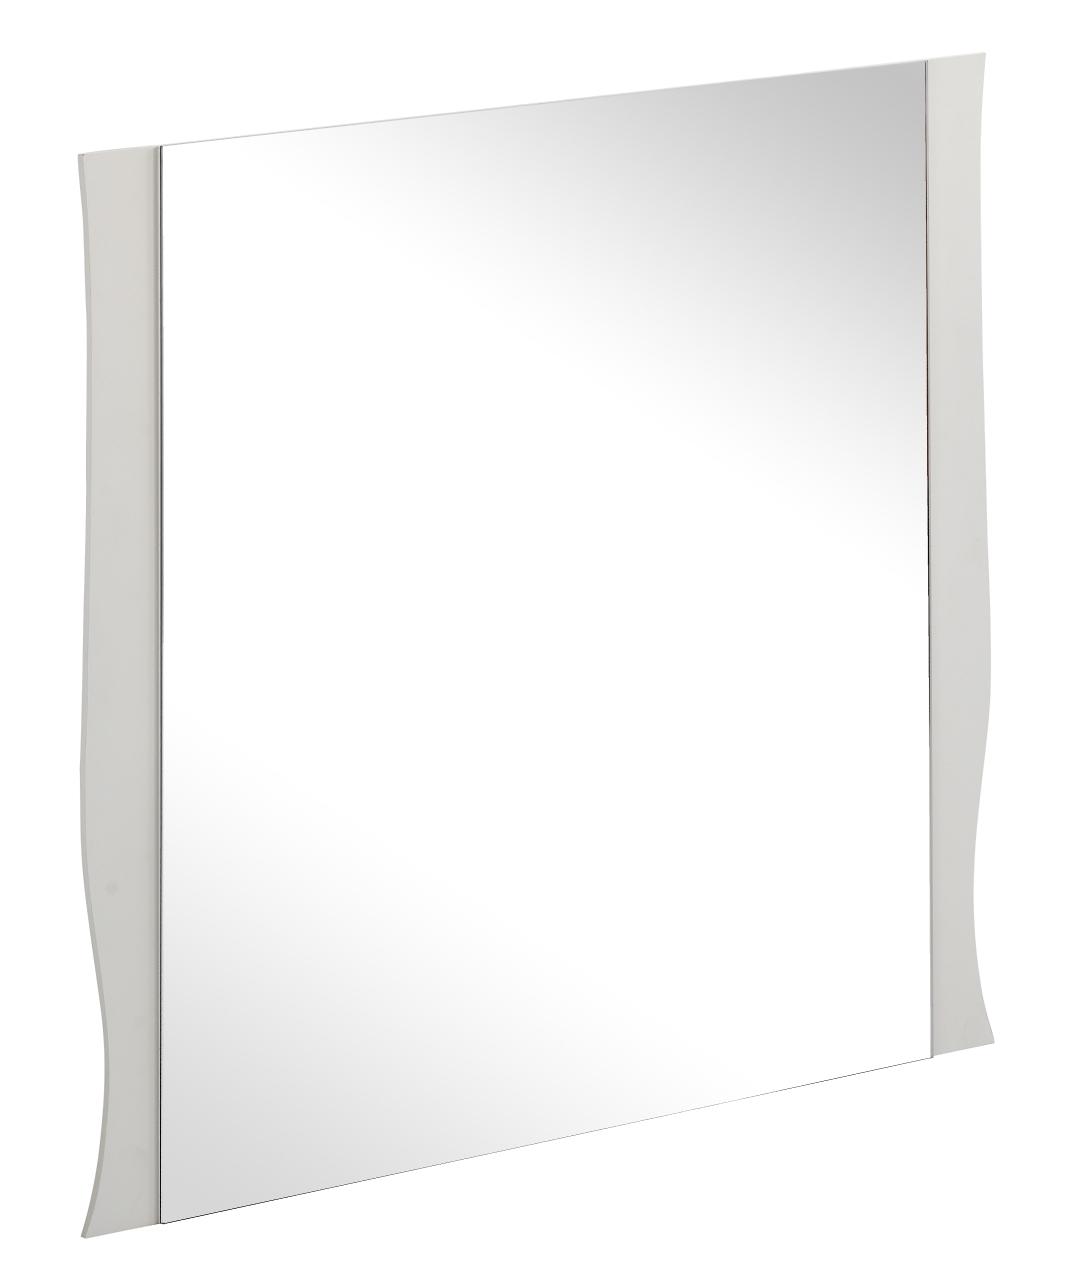 Oglinda pentru baie, L80xl60 cm, Elisabeth imagine